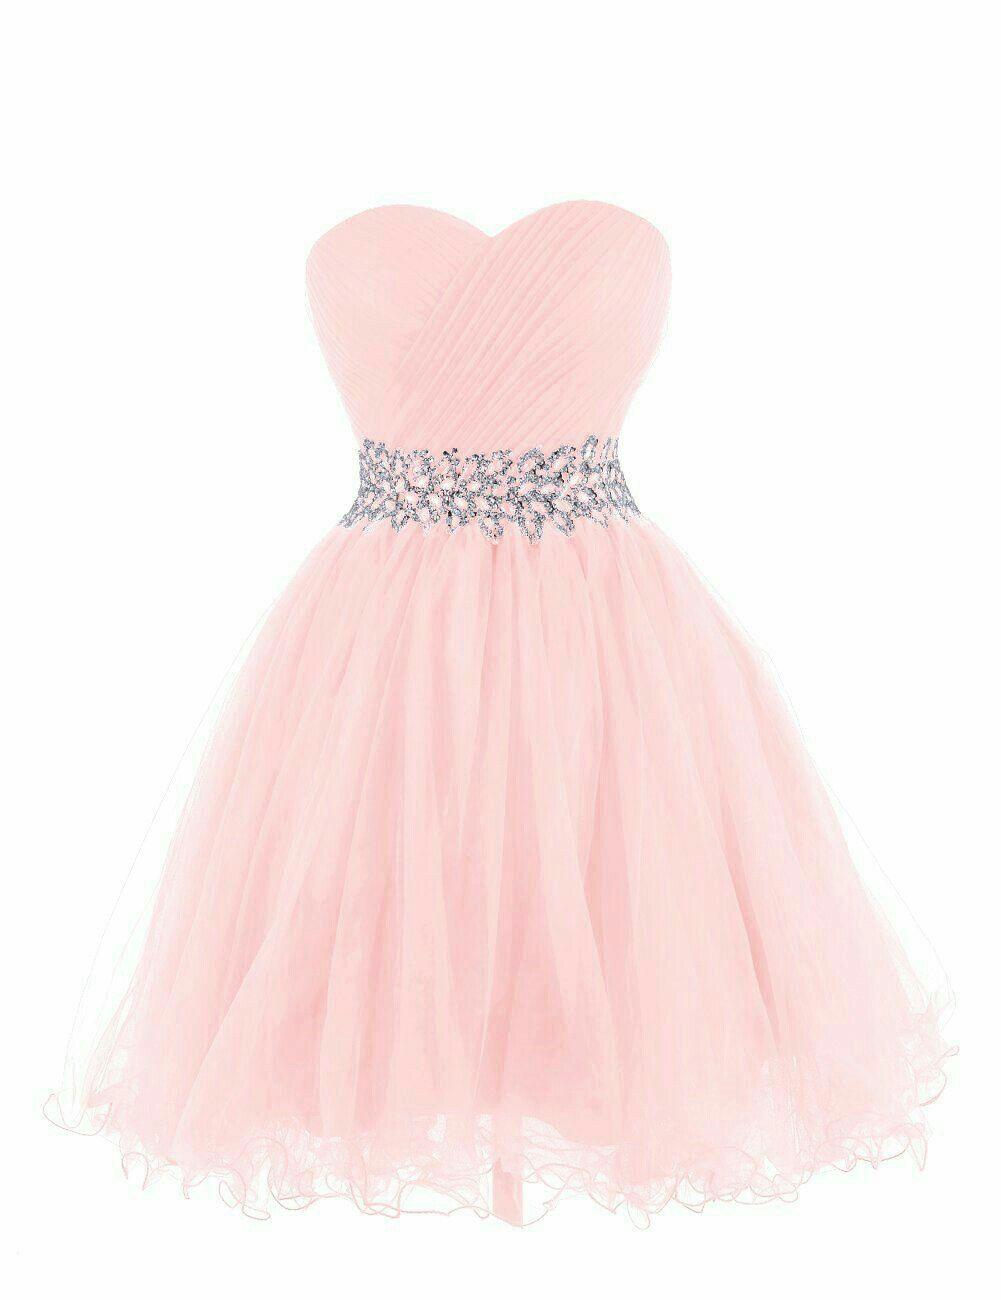 Pin by Vishakha Bang on mesmerizing dresses   Pinterest   Formal ...